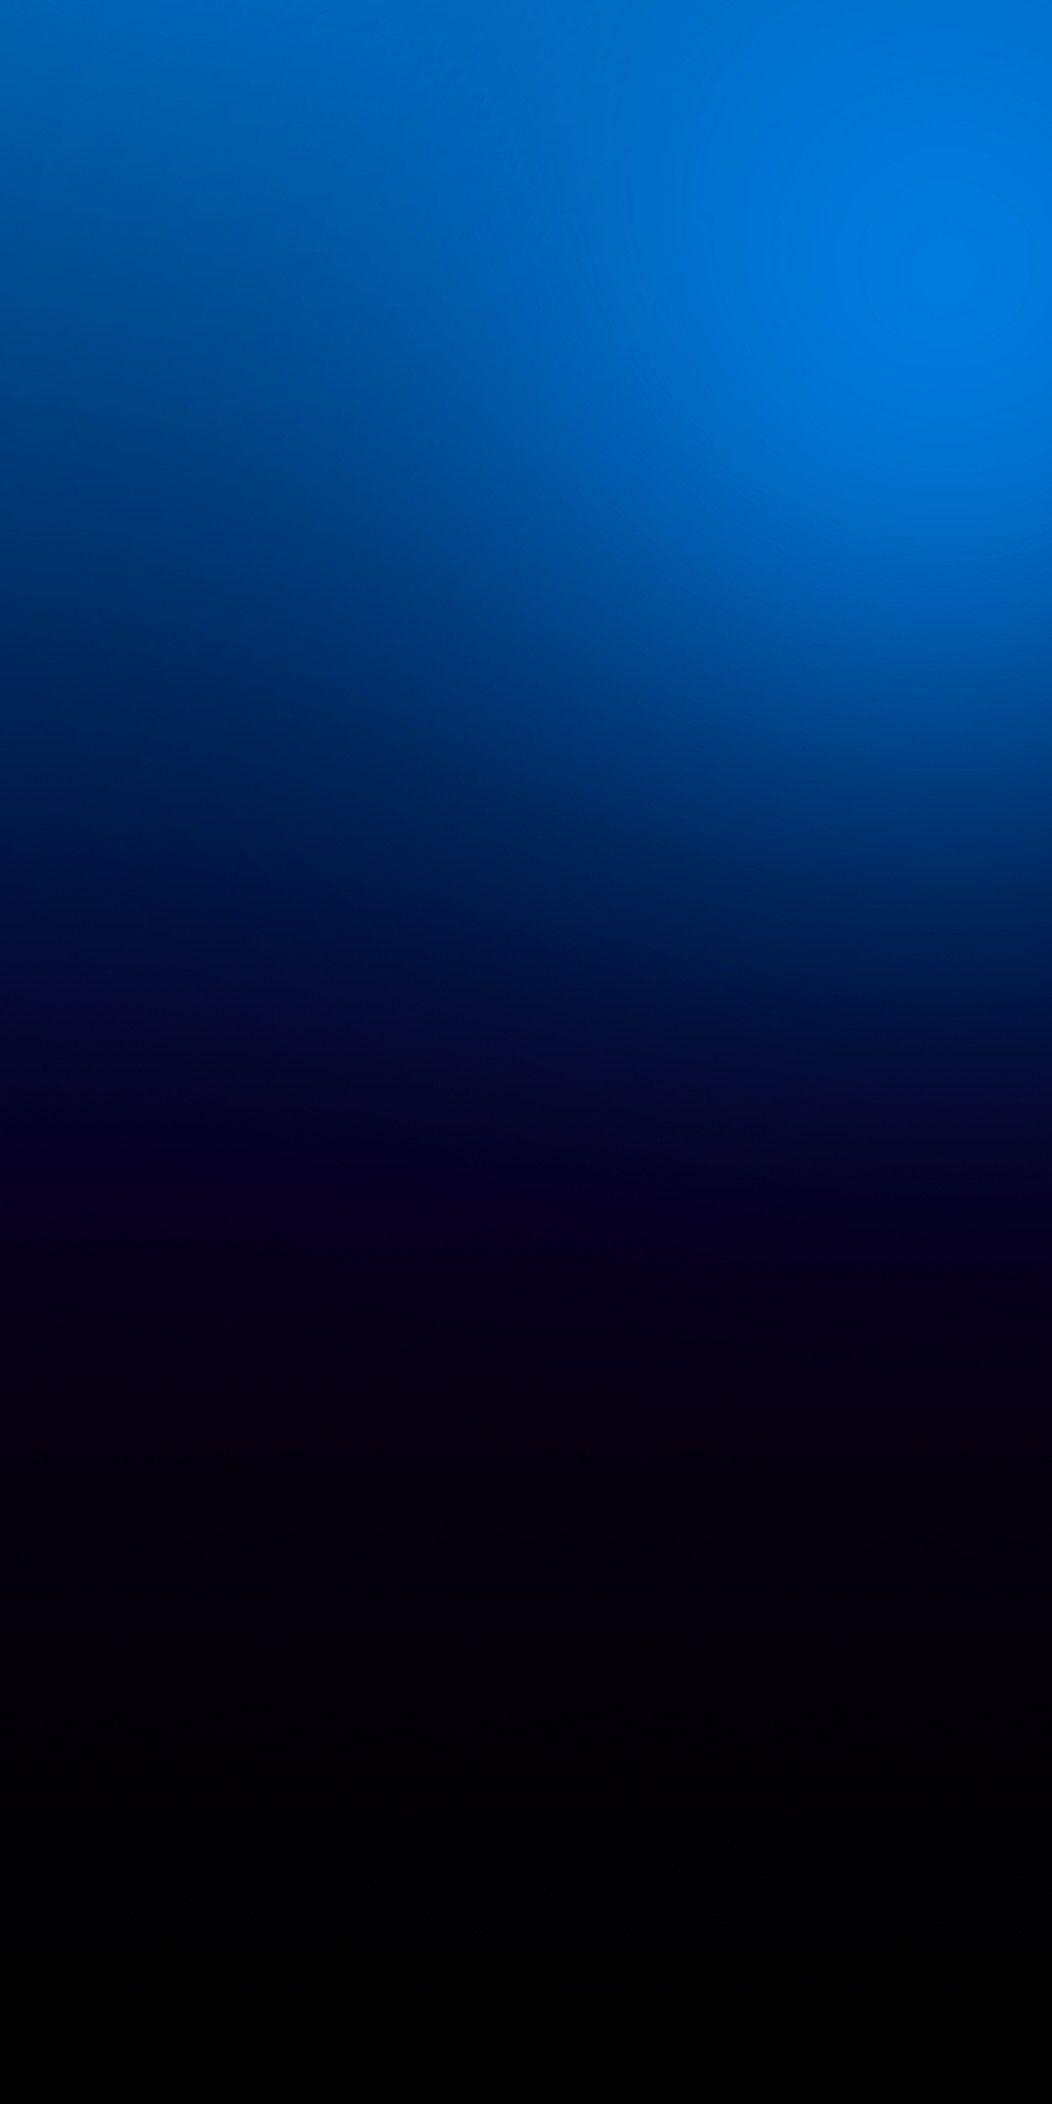 Pin On Wallpapers Dark blue plain wallpaper hd